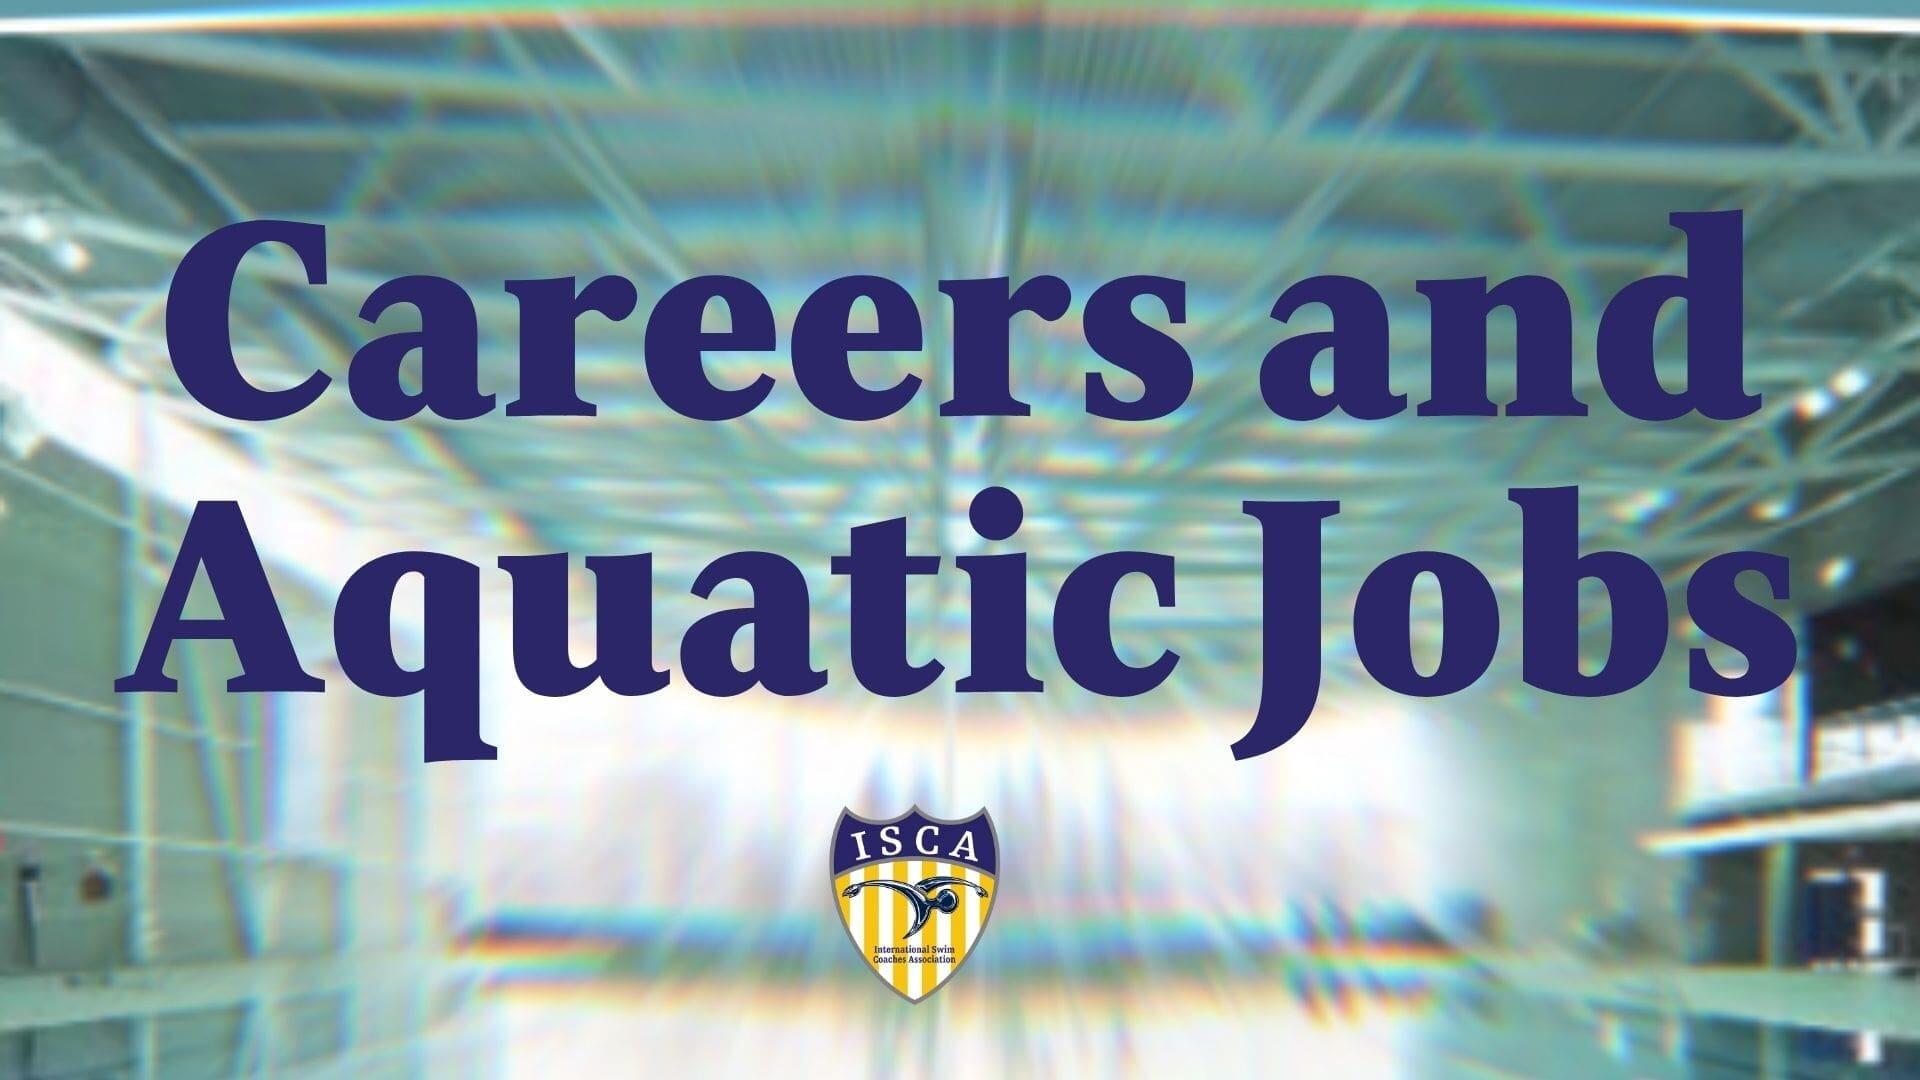 Careers and Aquatic Jobs